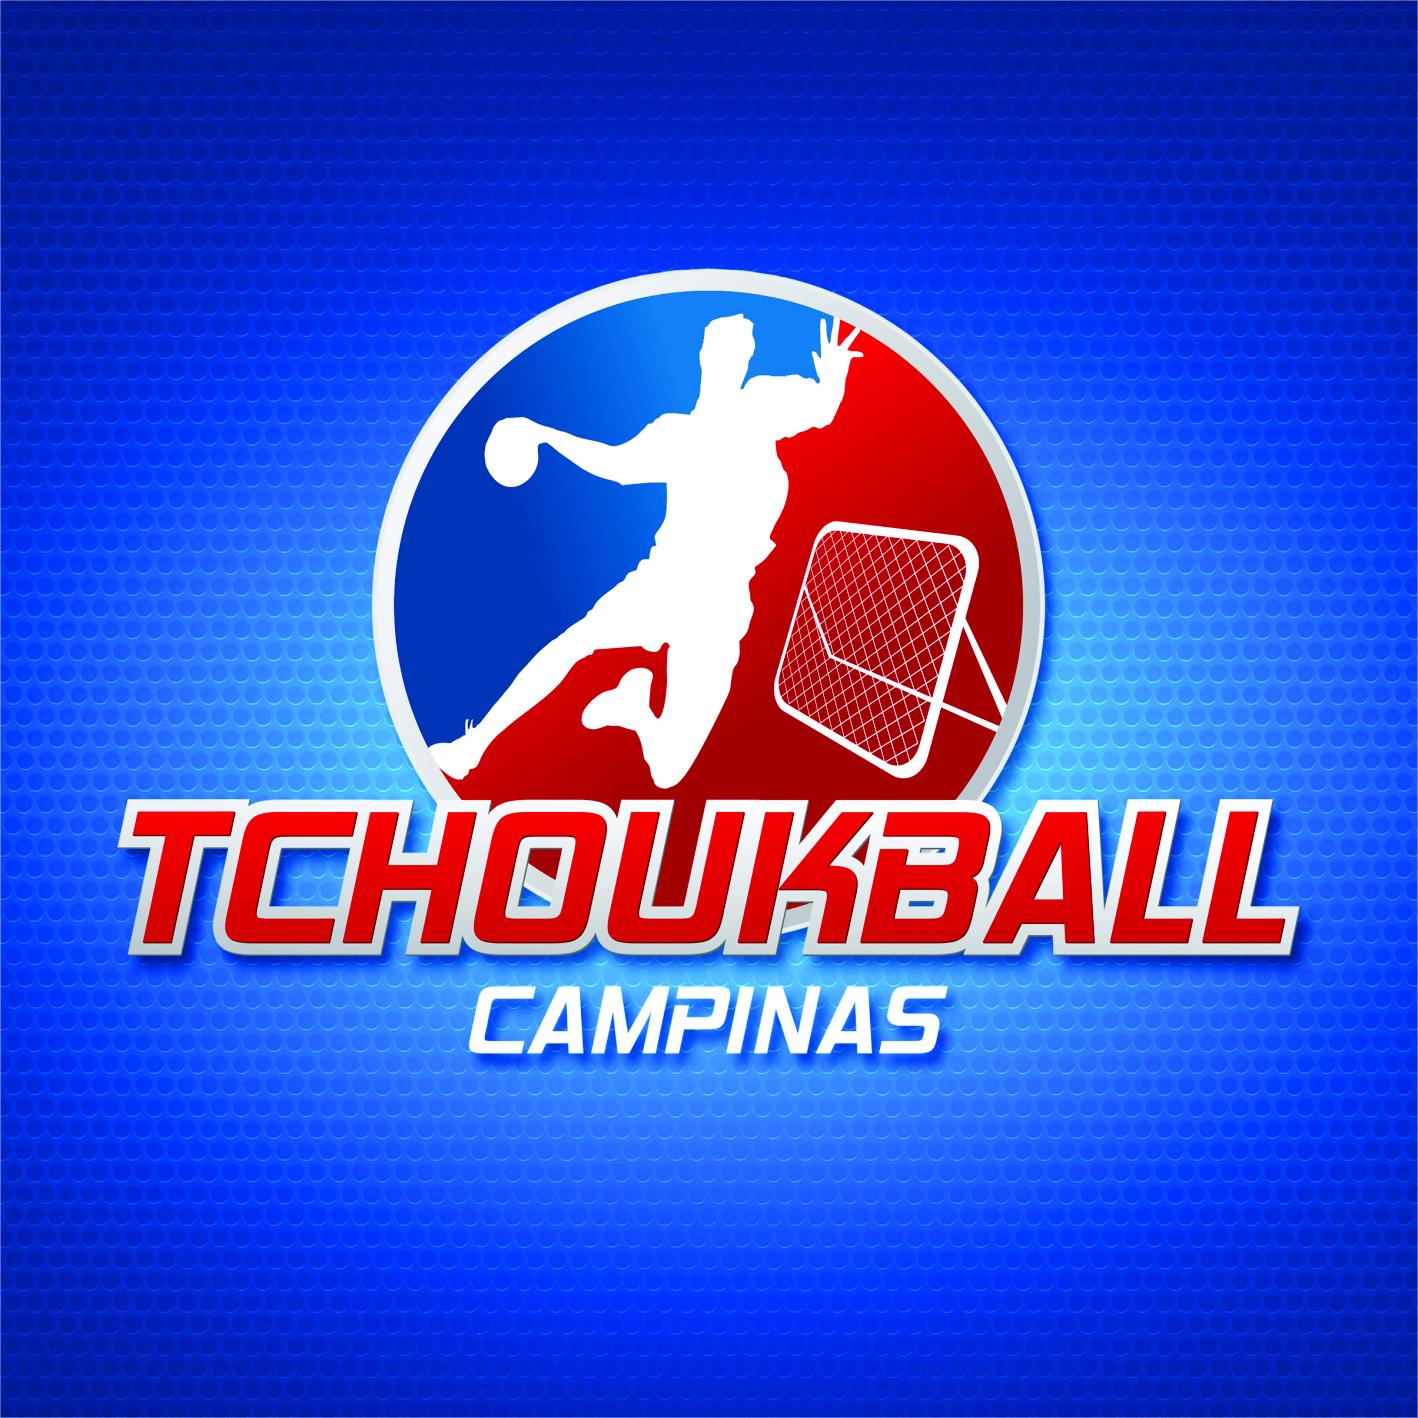 Tchoukball Campinas